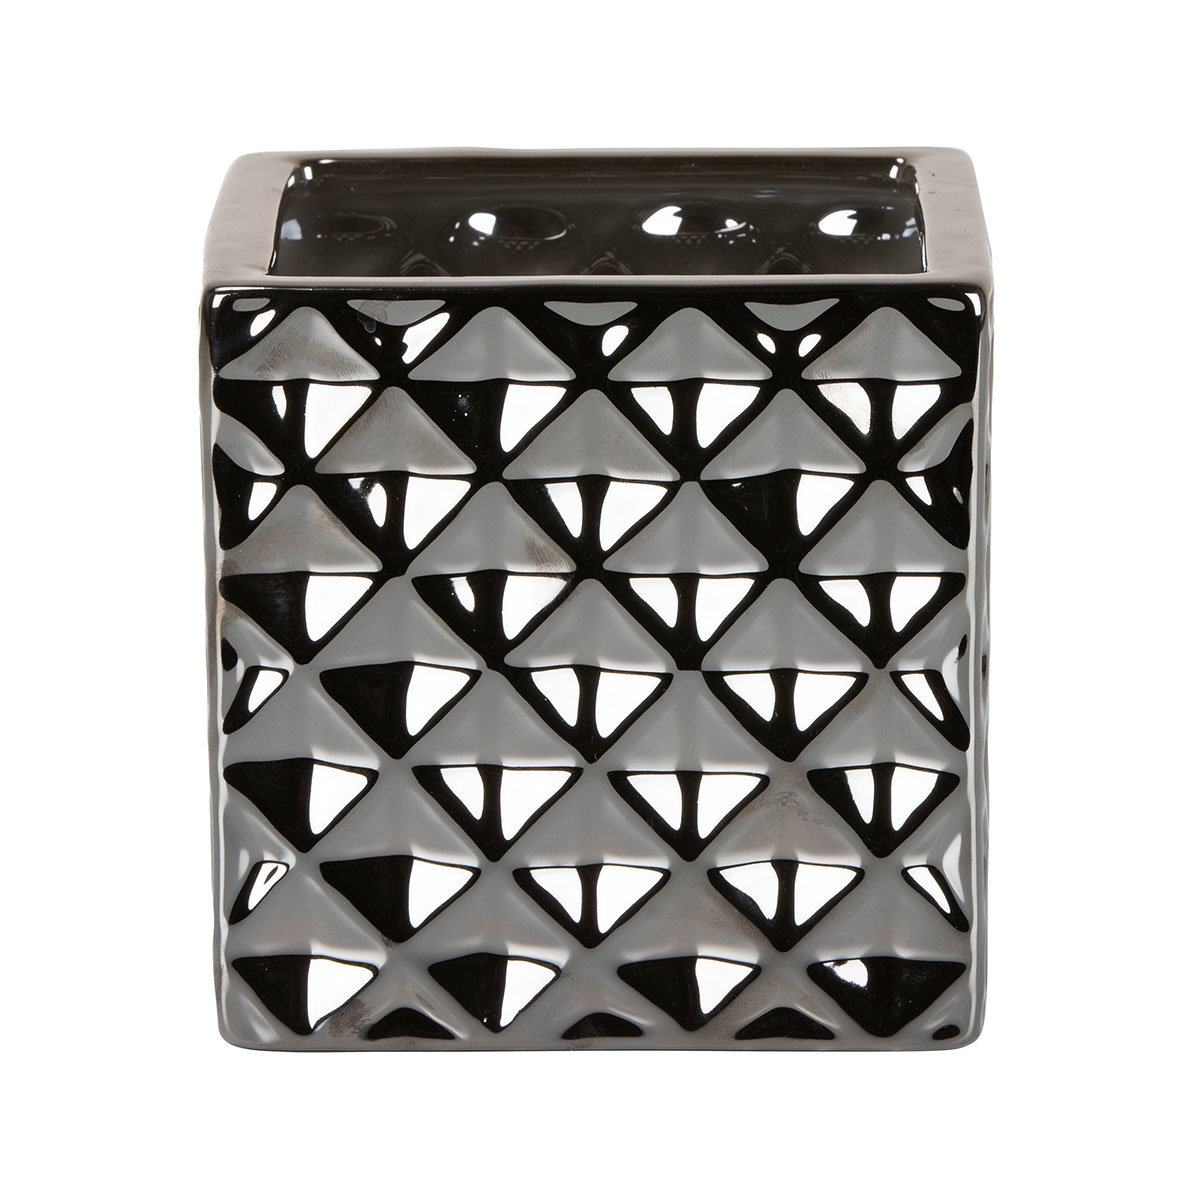 Übertopf Titanium Silver Cube, 15 cm, Silber | #2